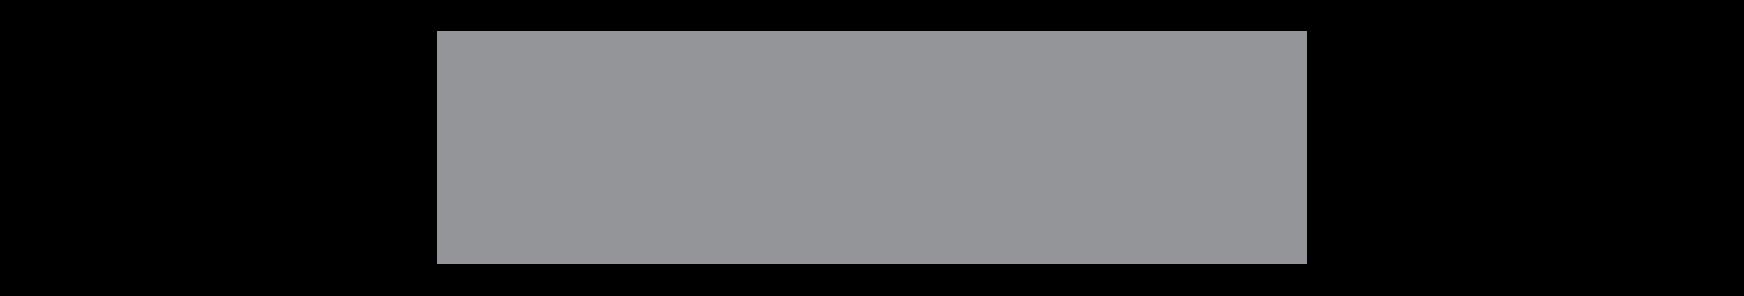 STARTER_grey2